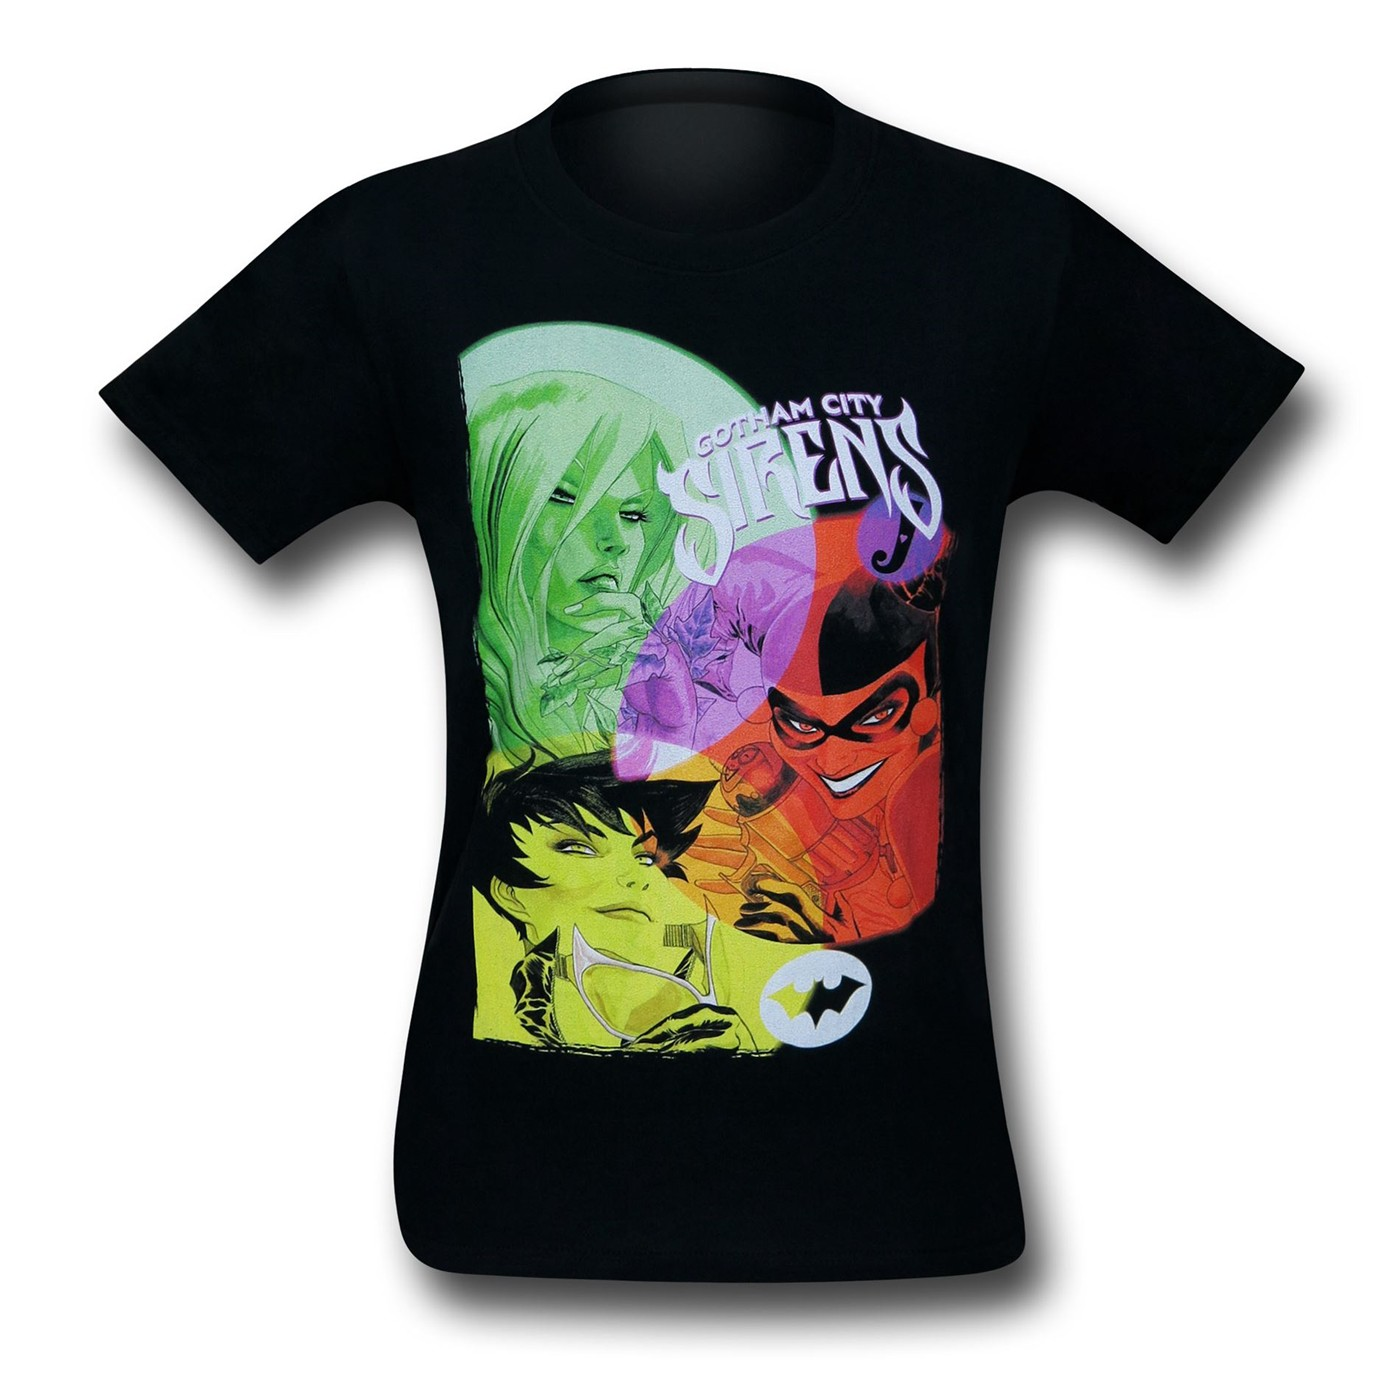 Gotham City Sirens Retro Black T-Shirt